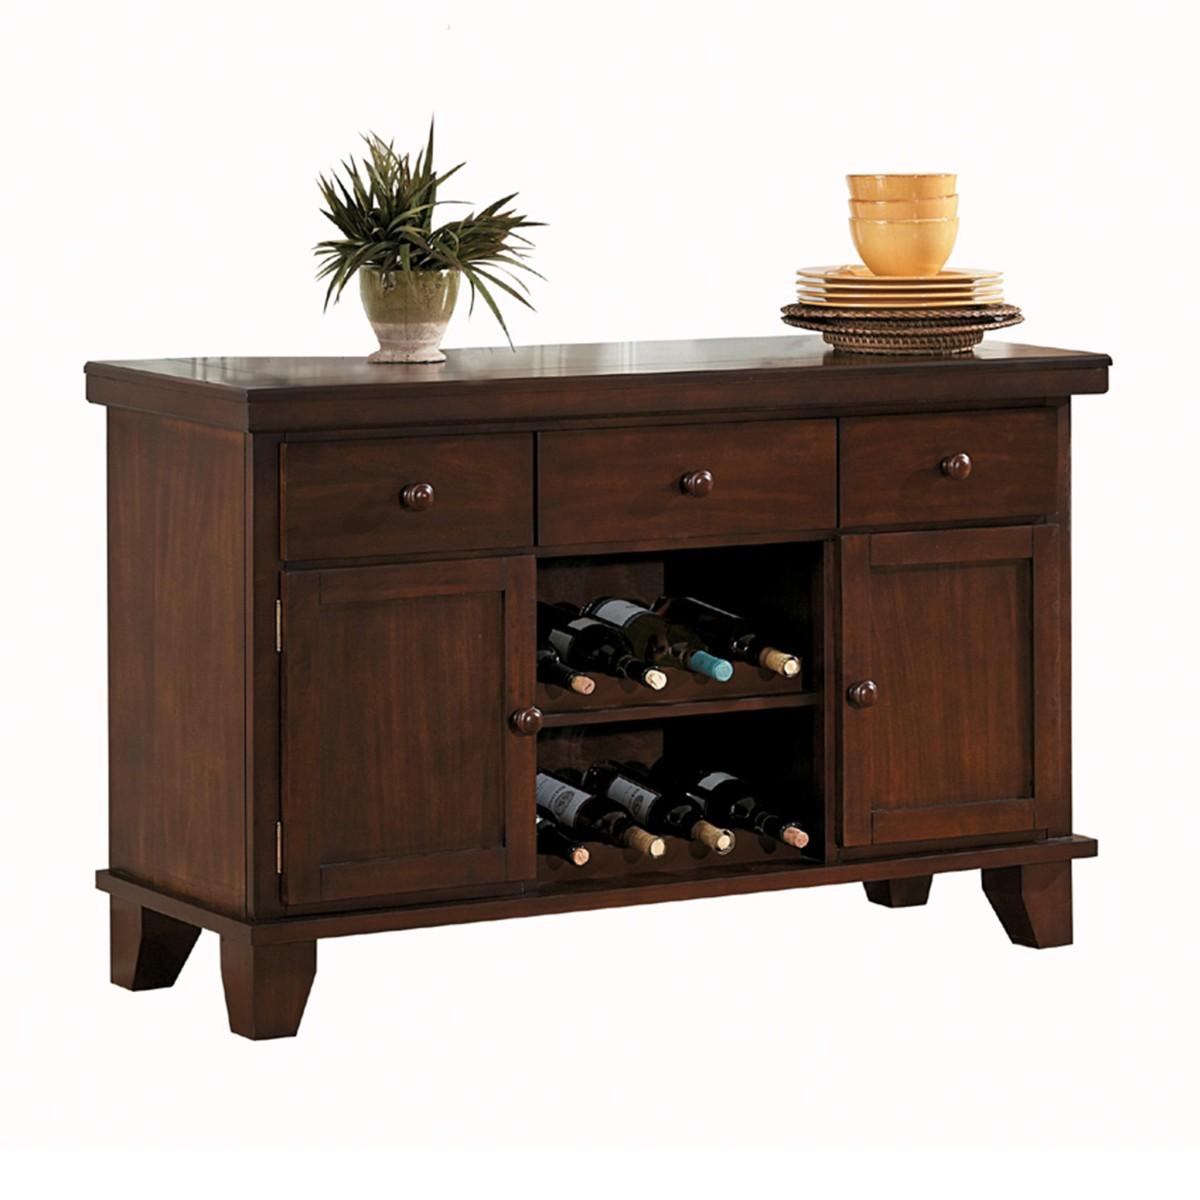 Homelegance 586-40 Ameillia dark oak finish wood side board server buffet cabinet